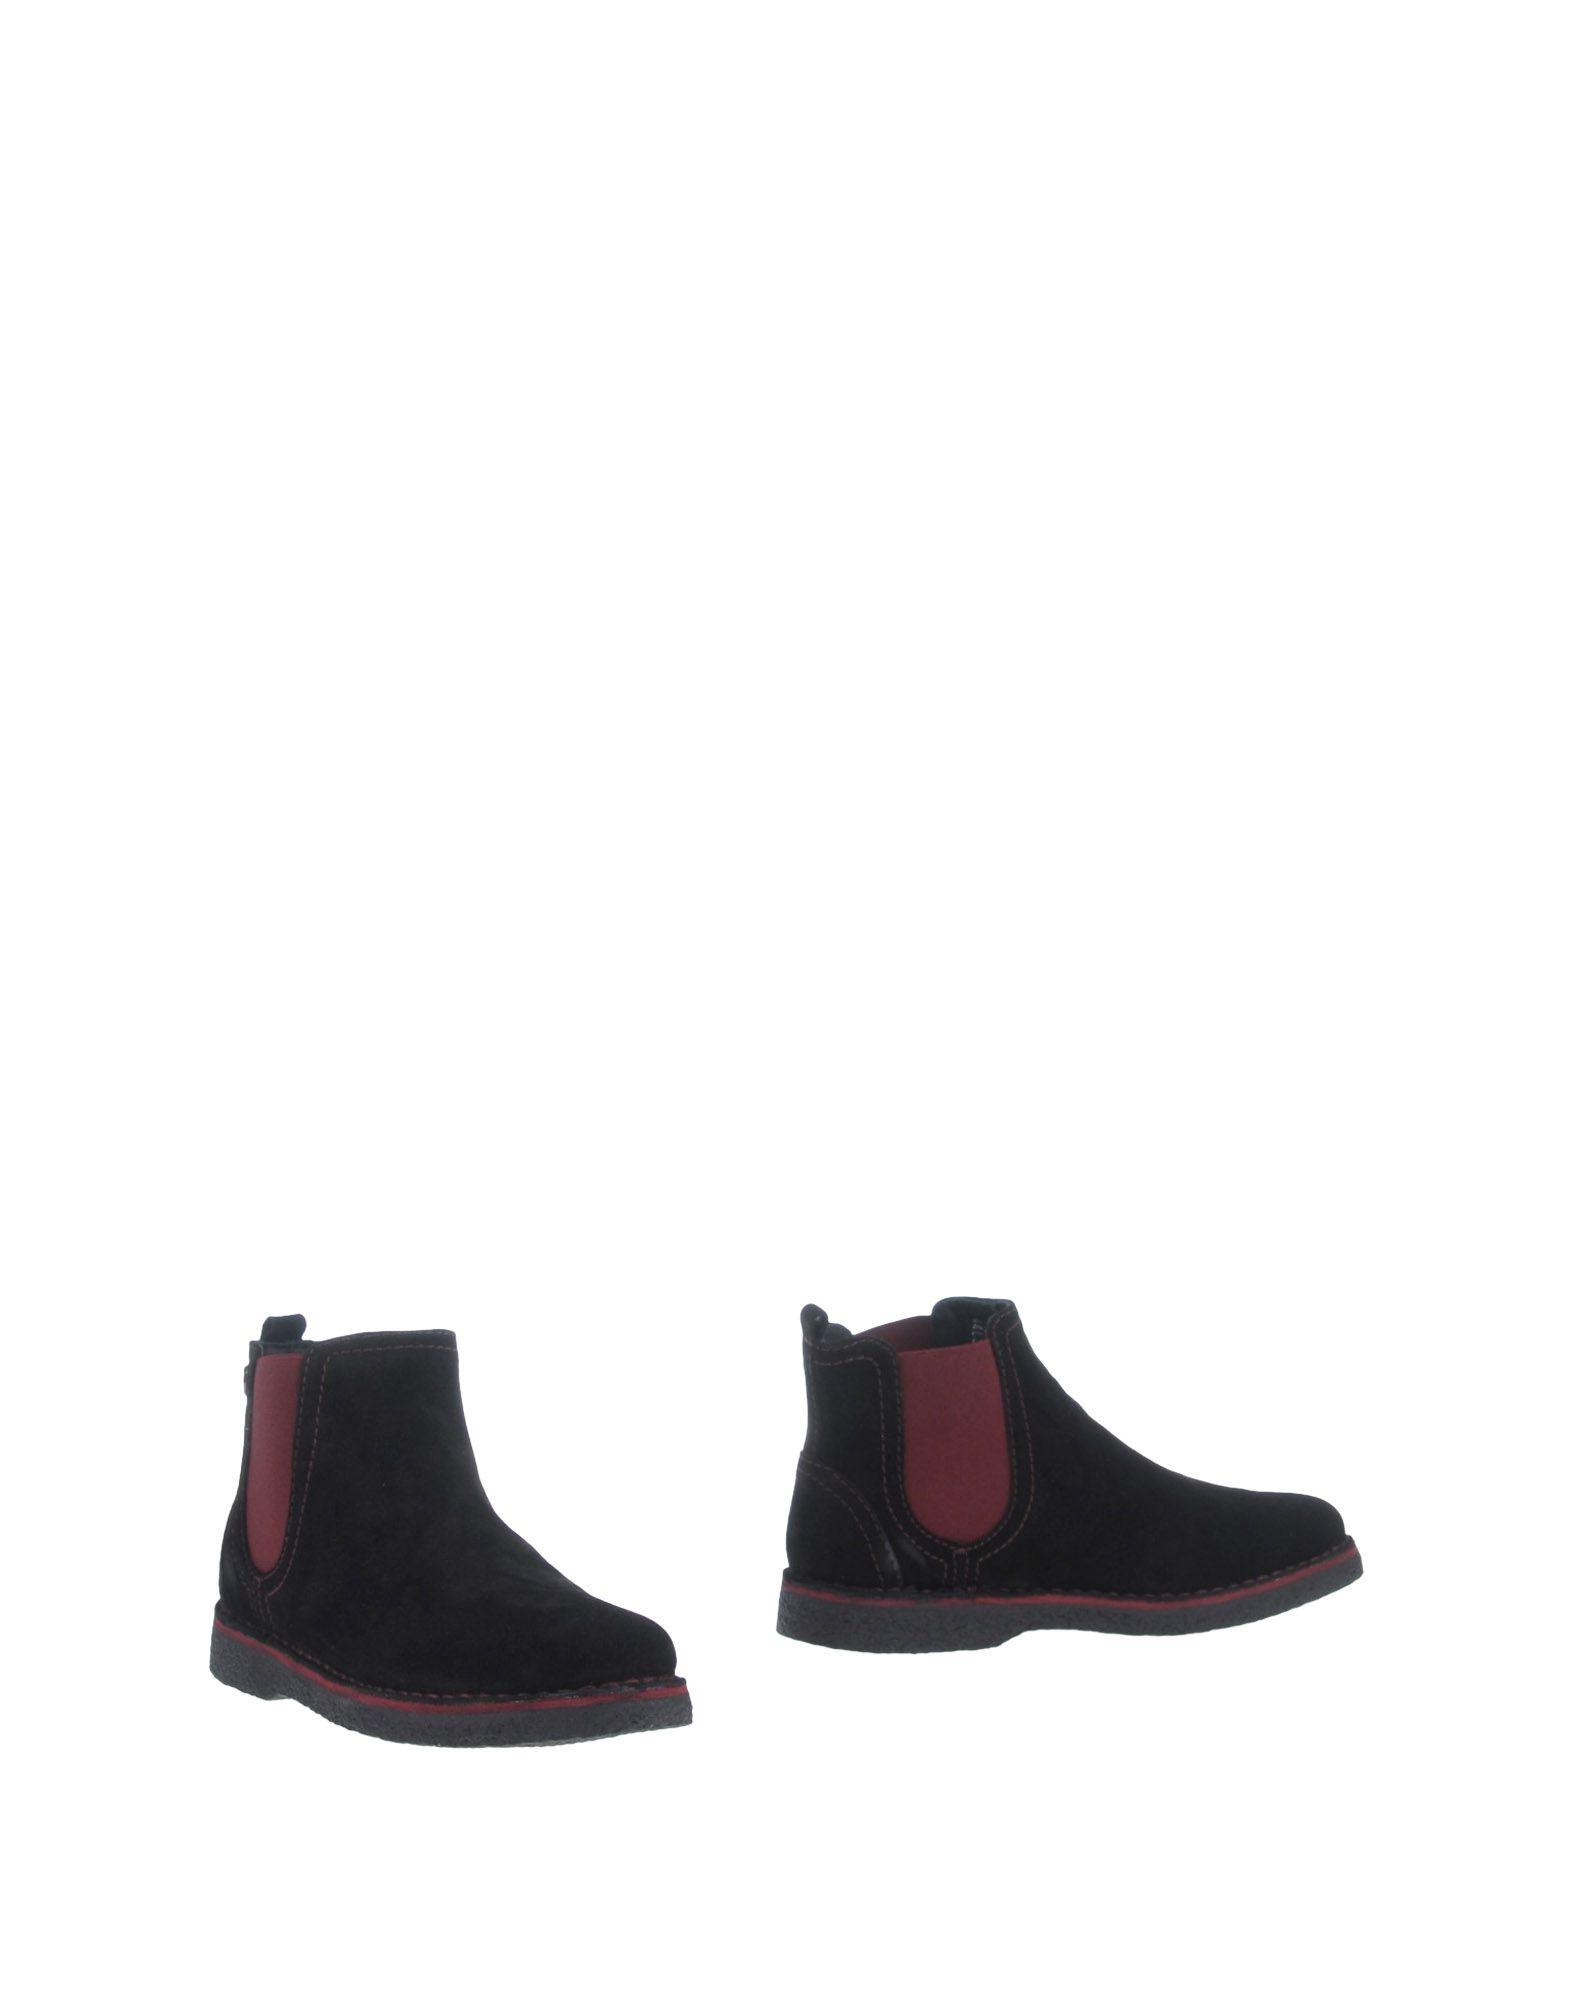 GEOX Полусапоги и высокие ботинки george j love полусапоги и высокие ботинки